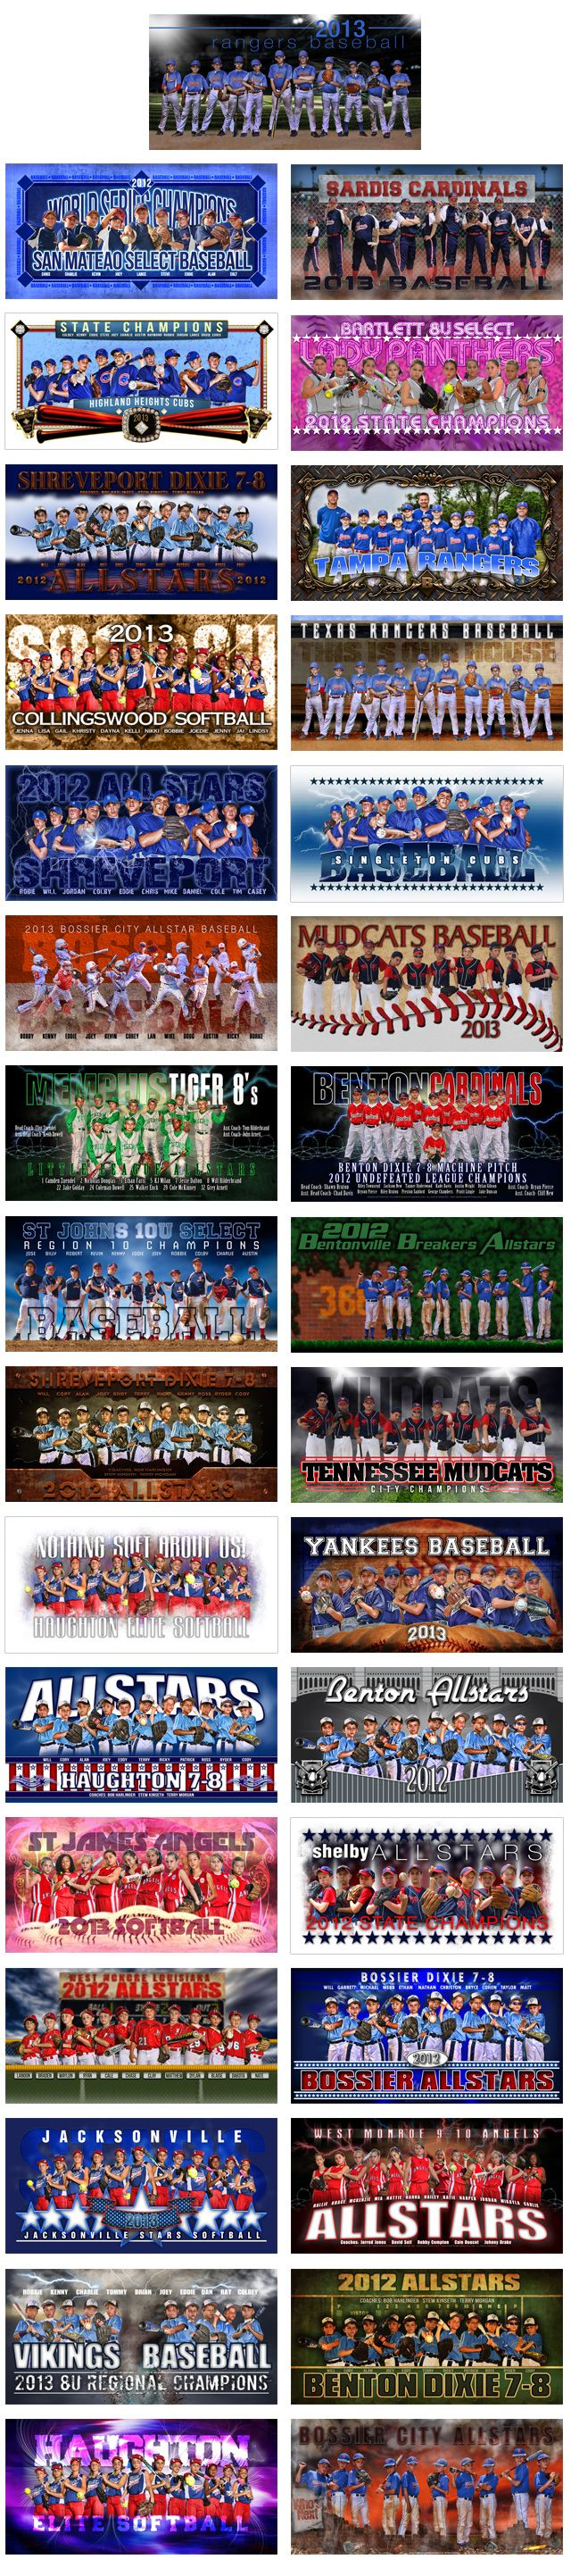 Team Banner Special - Sportszonetemplates.comSportszonetemplates.com